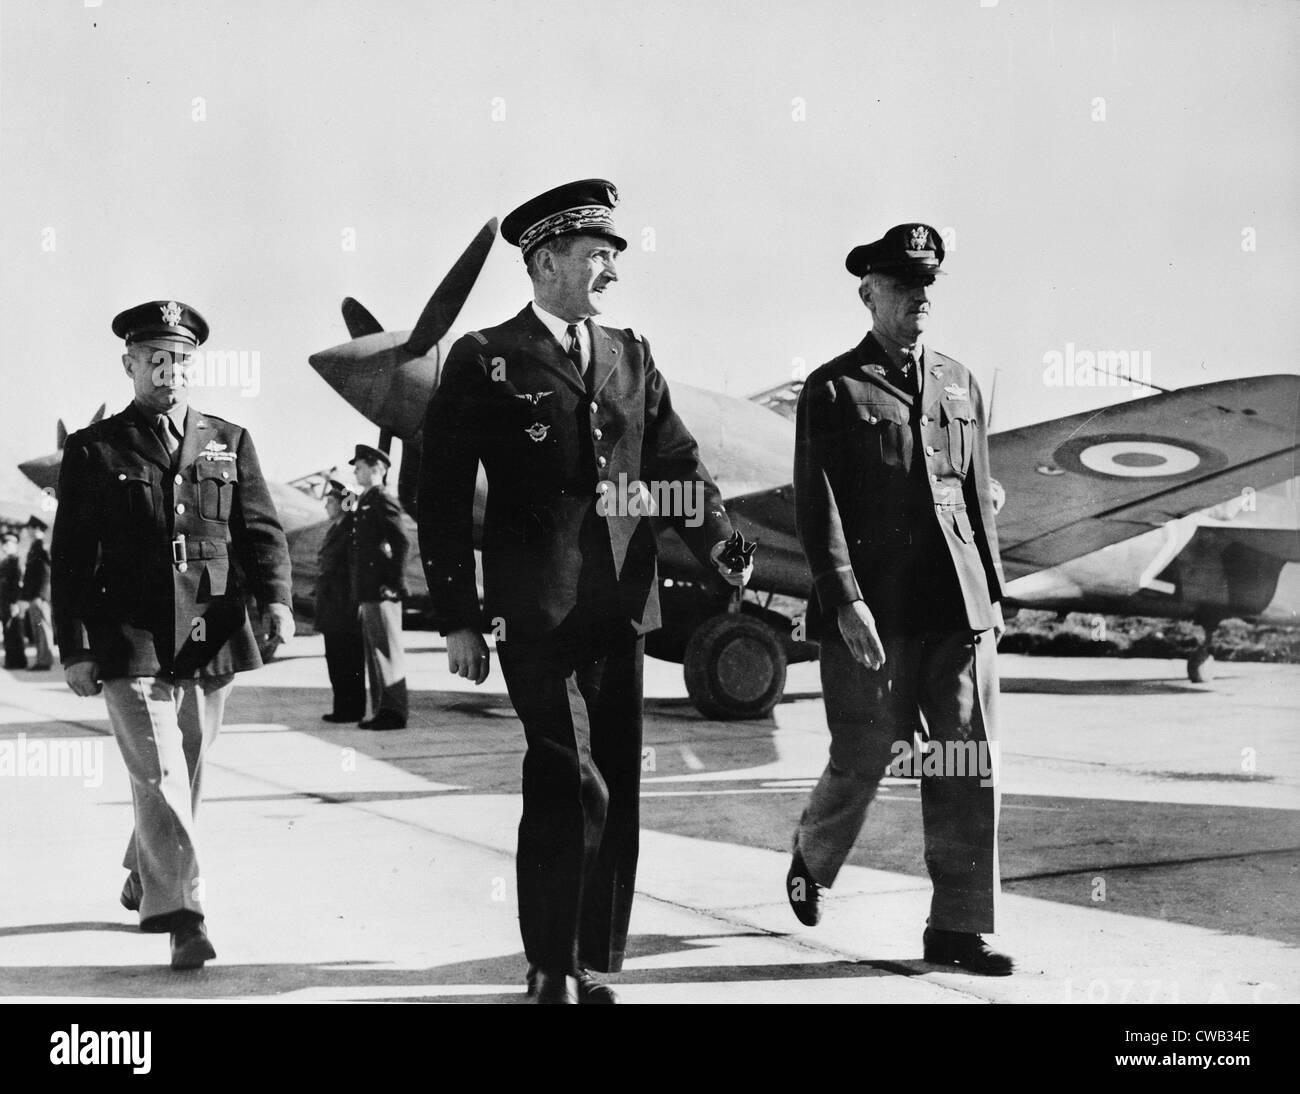 World War II, Major General Carl Spaatz, United States Air Force commmander in North Africa, Major-General Jean - Stock Image